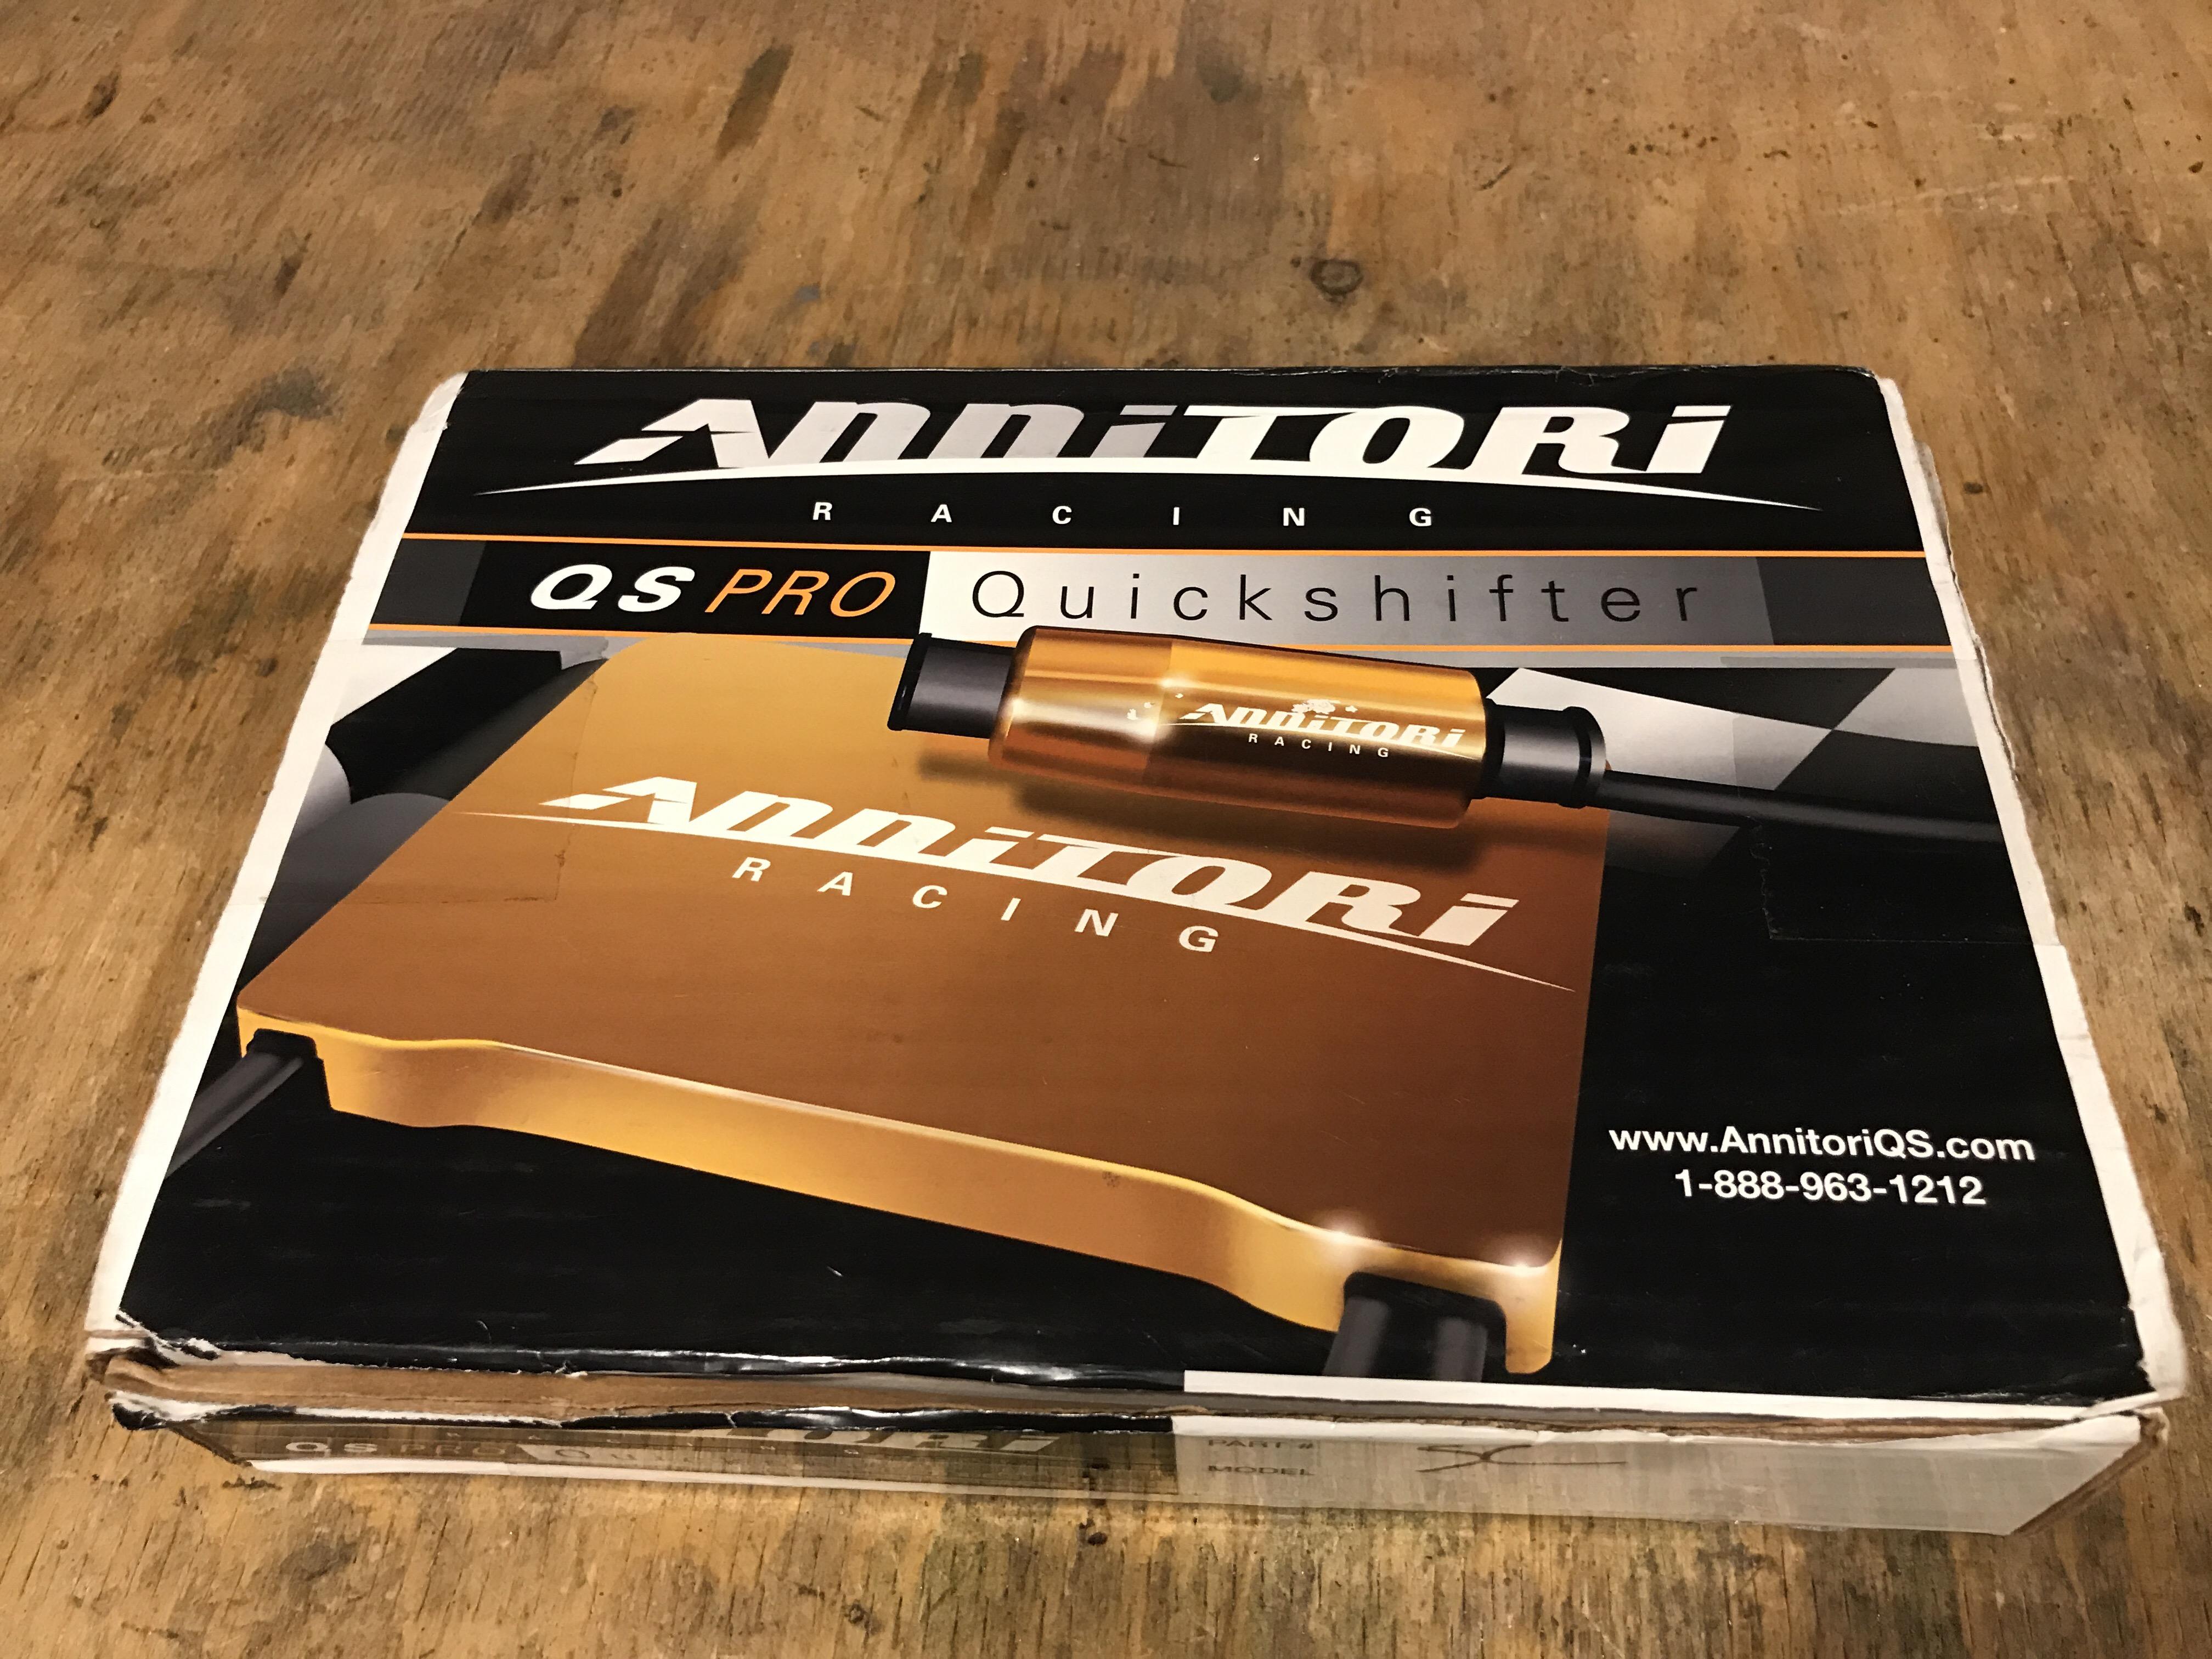 annitori qs pro quickshifter review & installation (2010 ducati